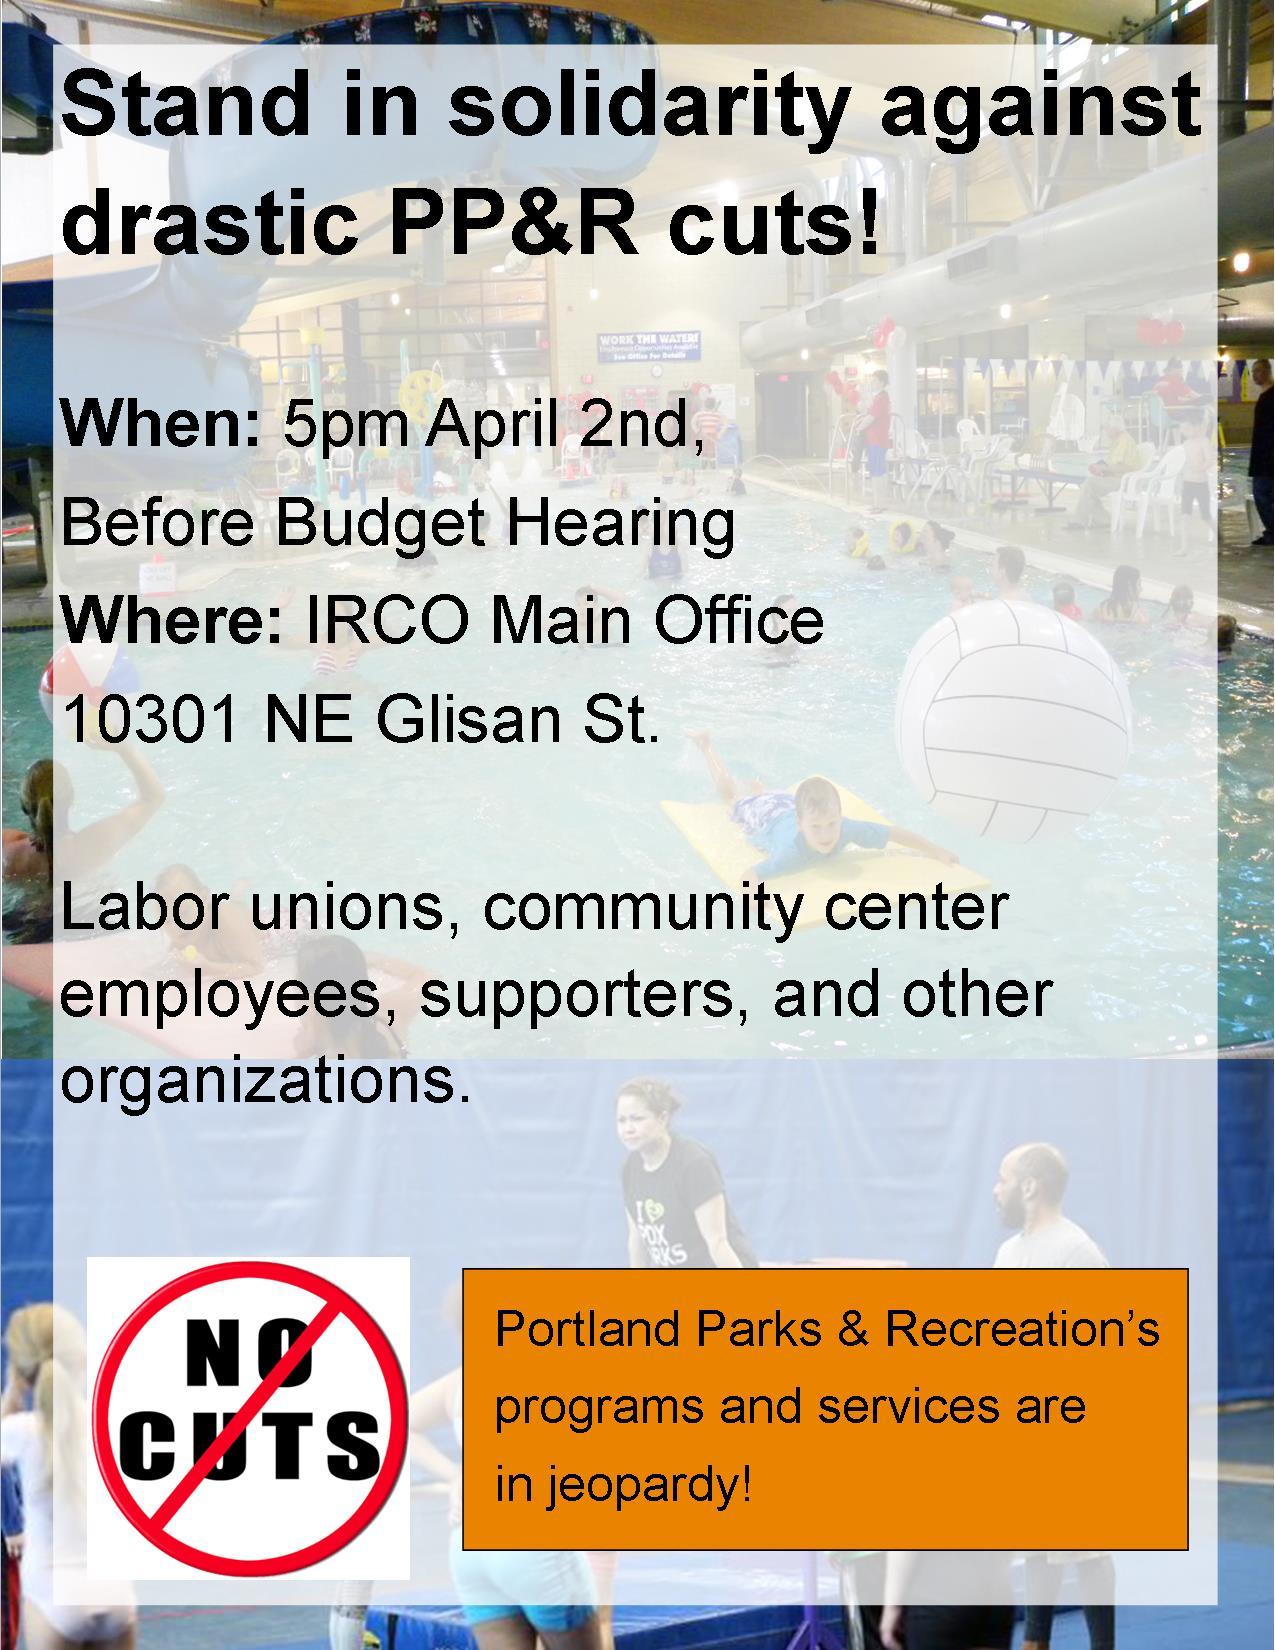 PP&R Budget Cuts poster.jpg